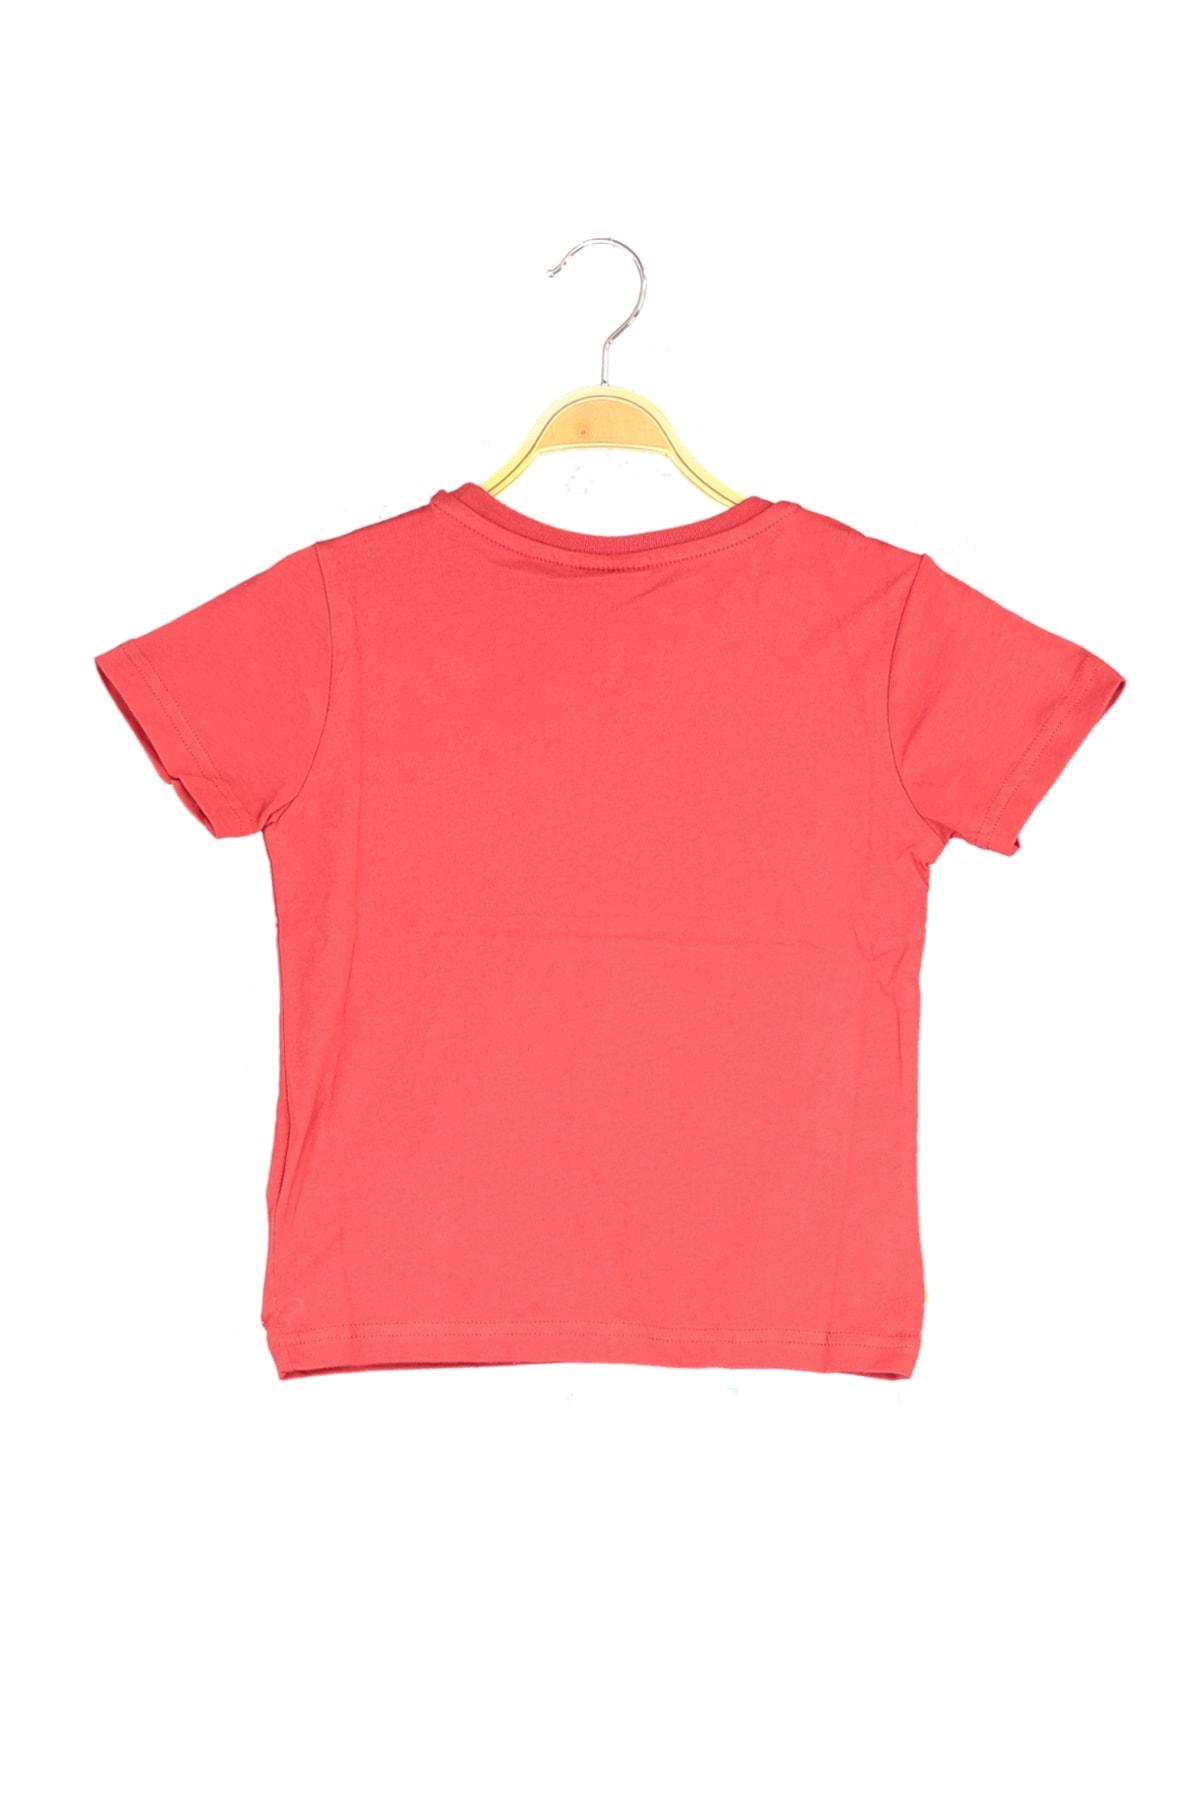 HUMMEL Kırmızı Erkek Çocuk T-Shirt 2